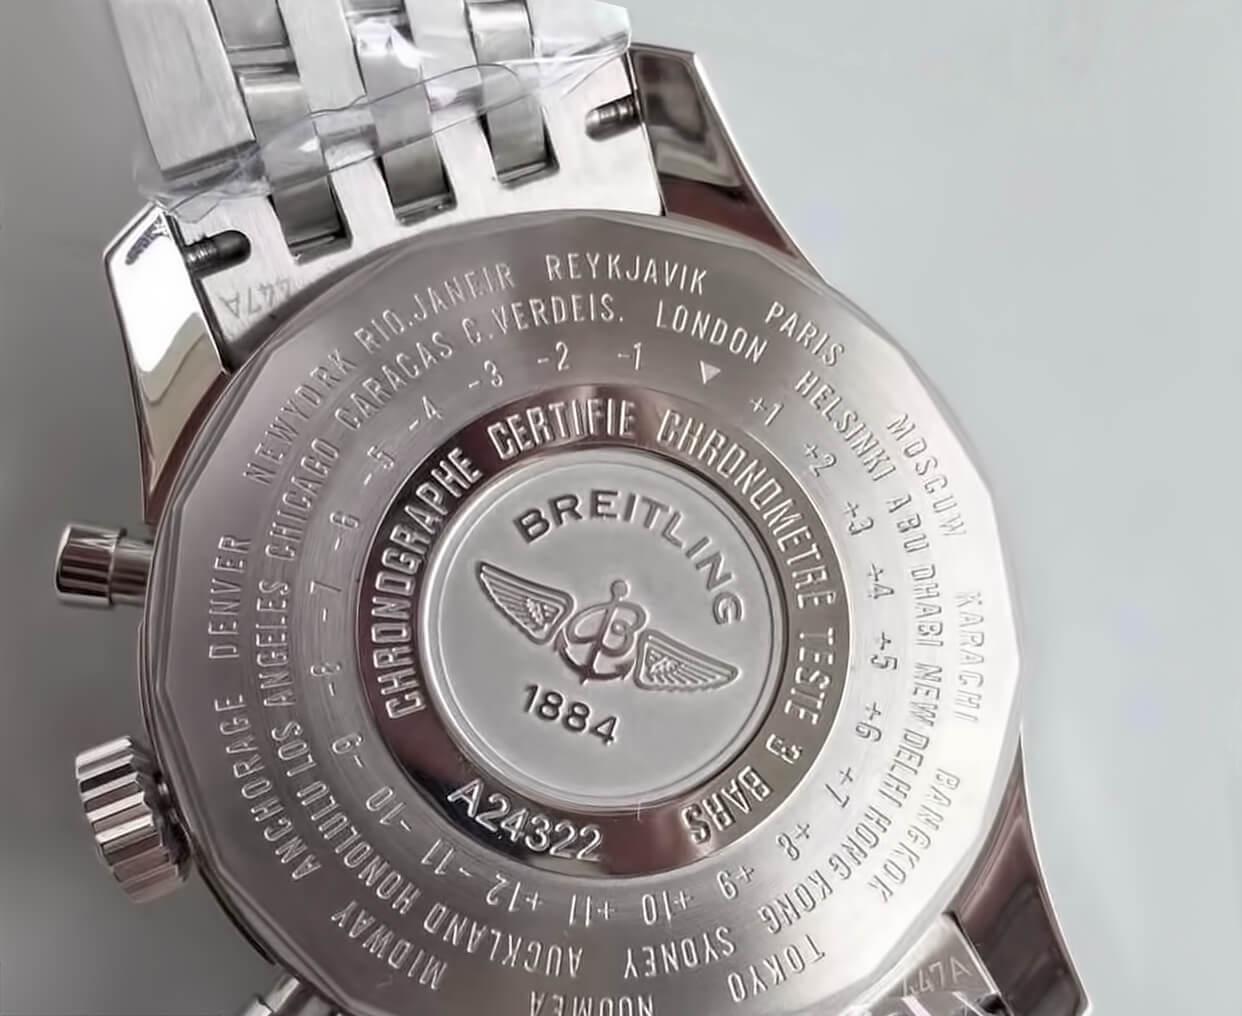 Надписи и обозначения на обороте корпуса часов Брайтлинг